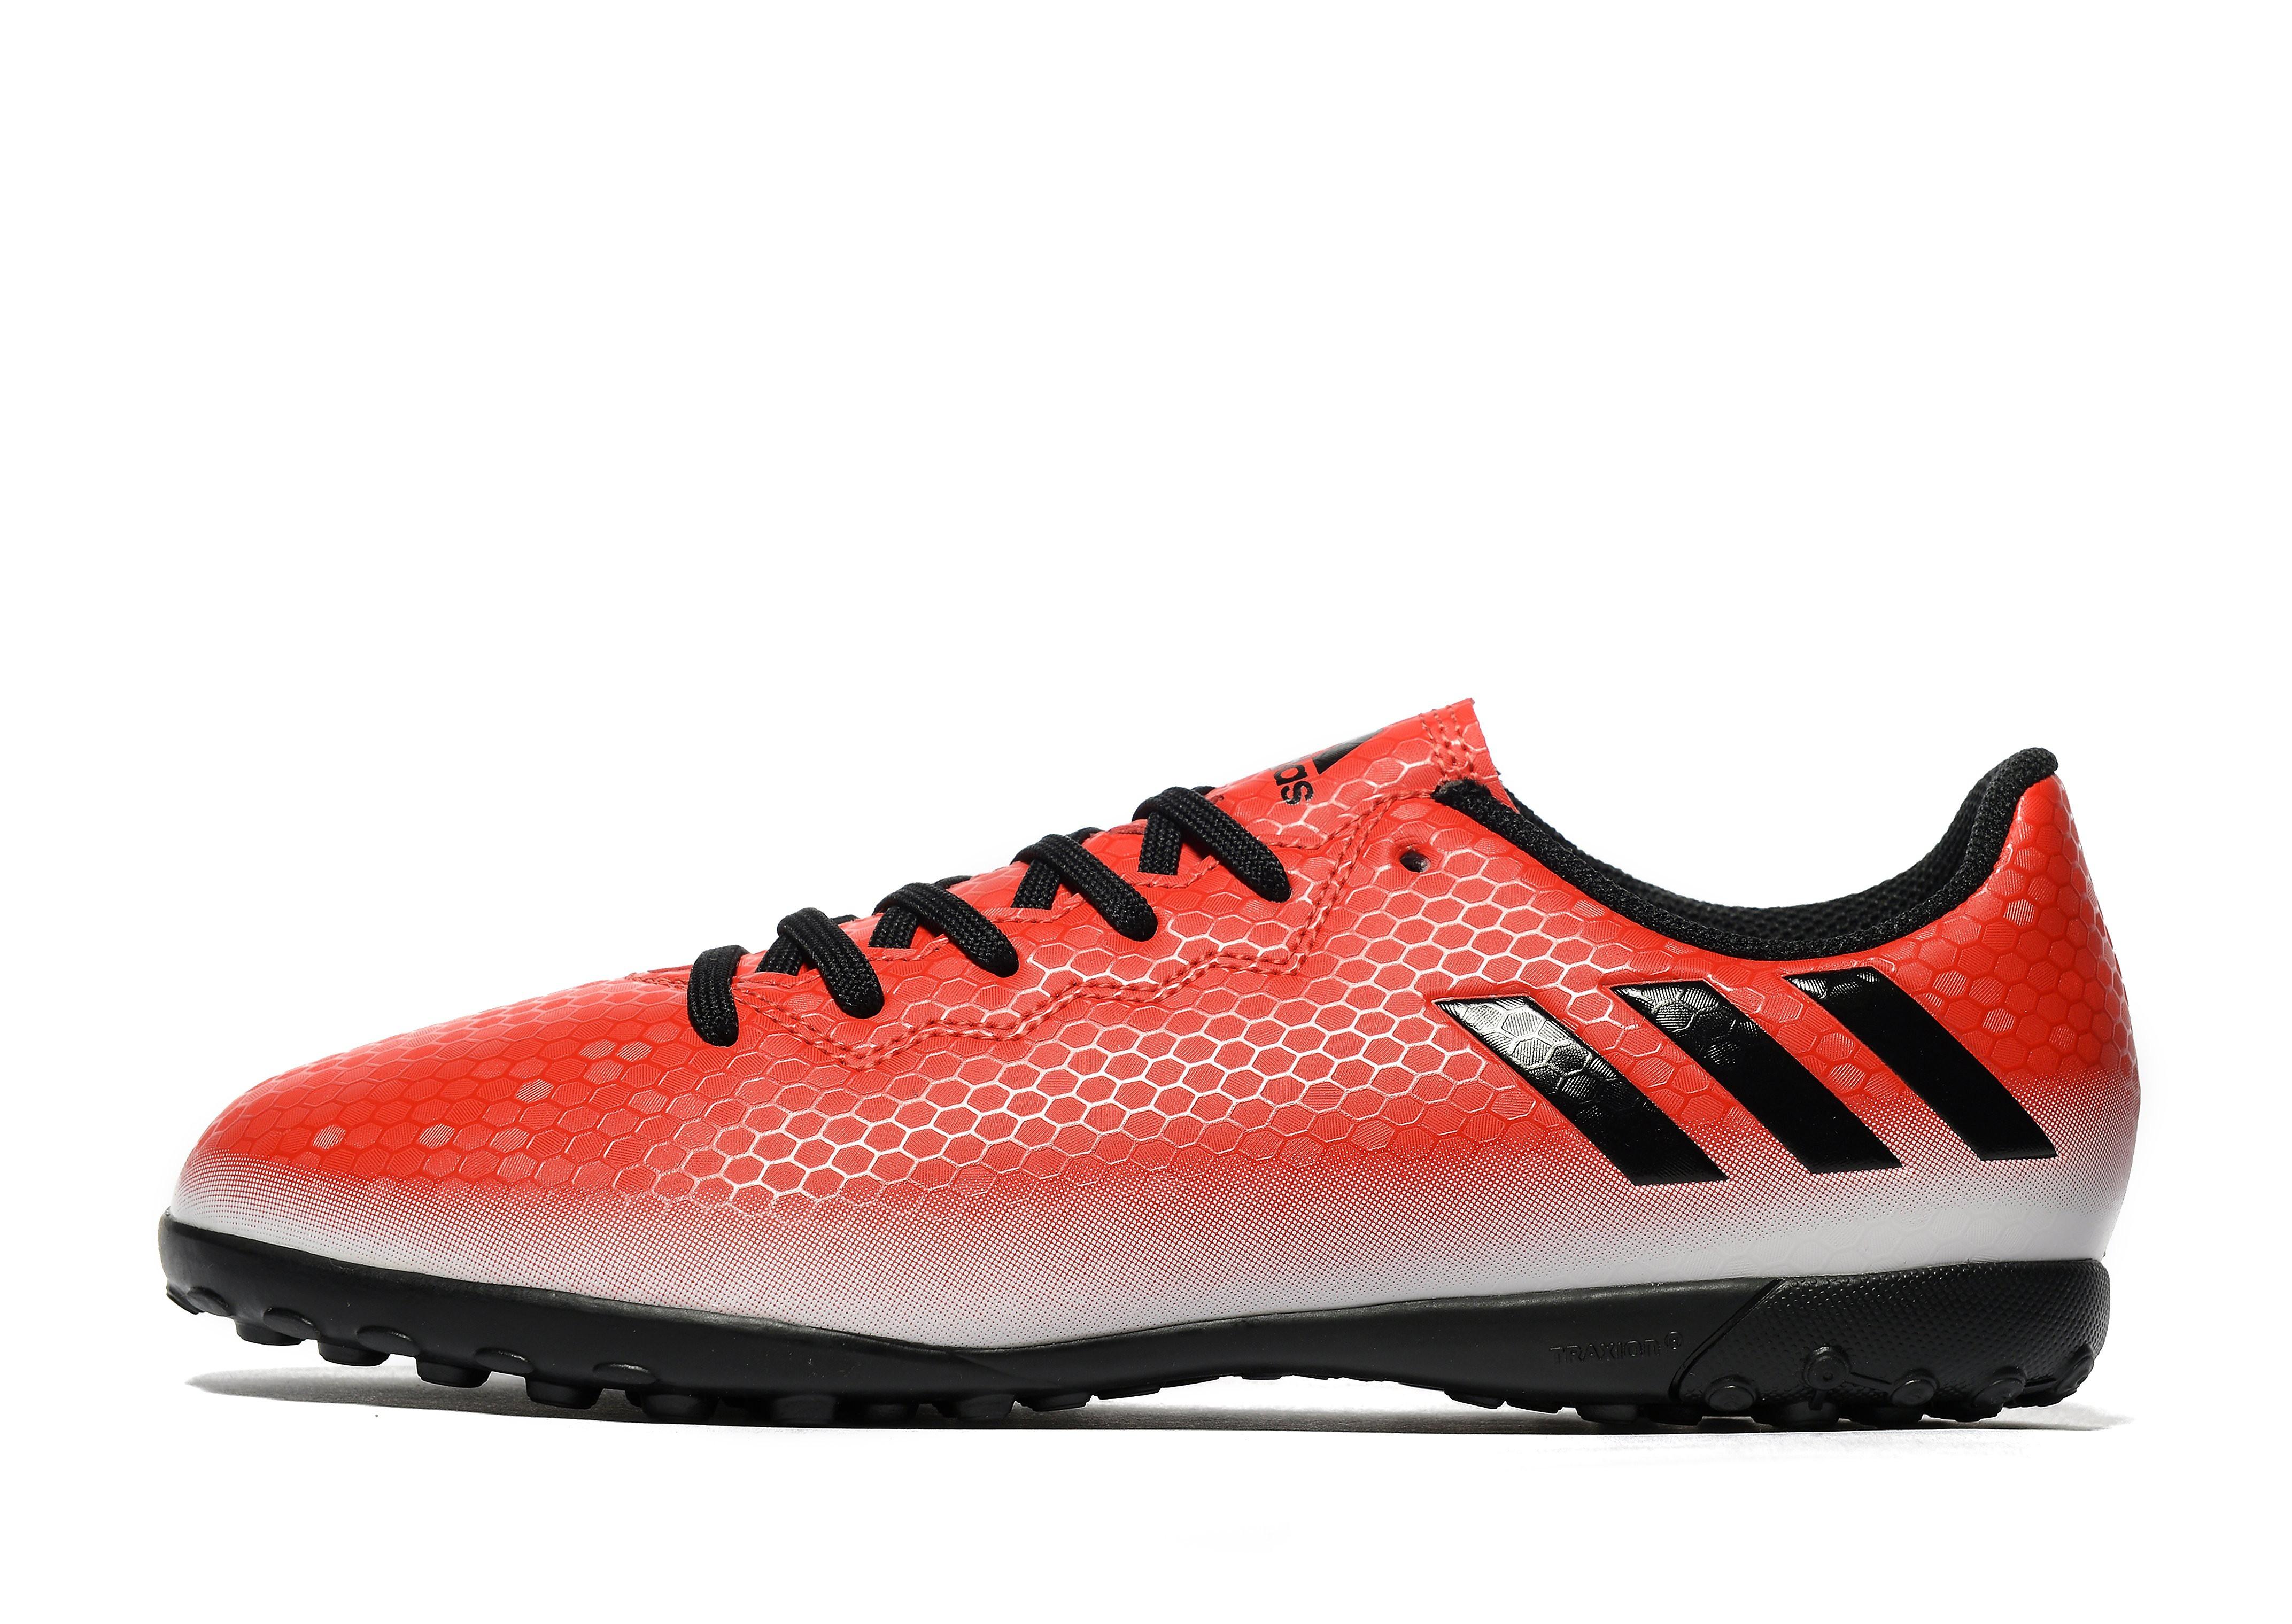 adidas Red Limit Messi 16.4 Turf Junior